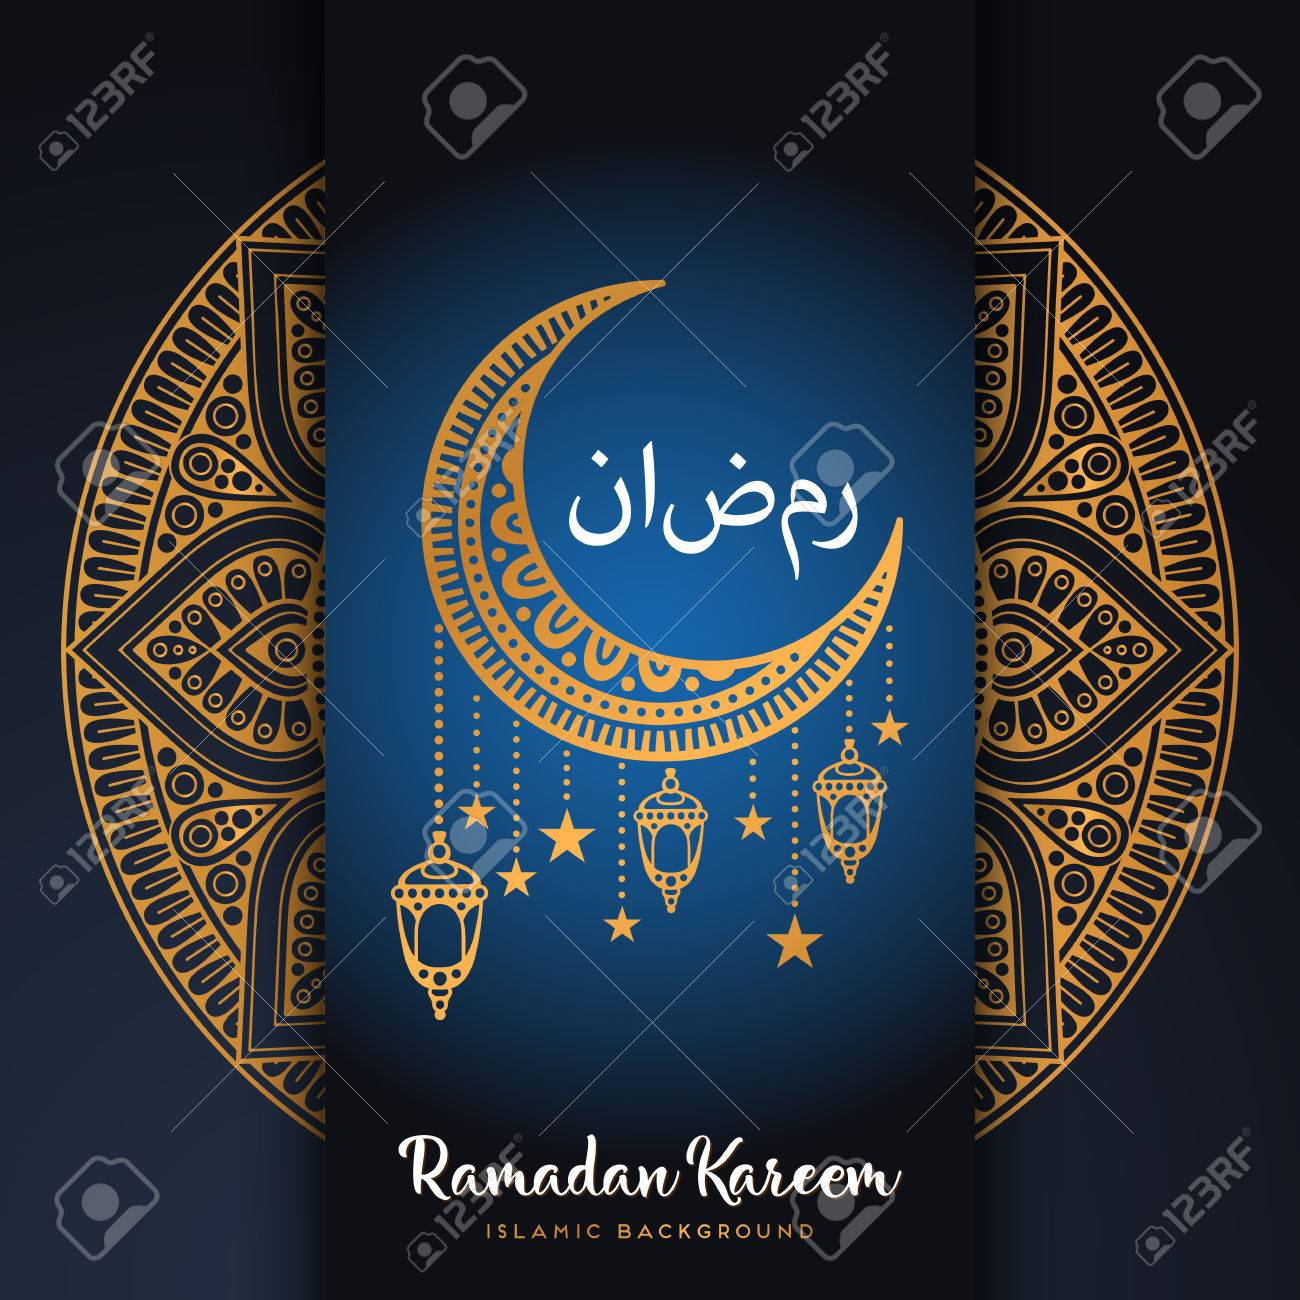 Month ramadan greeting card with arabic calligraphy ramadan kareem month ramadan greeting card with arabic calligraphy ramadan kareem stok fotoraf 79078325 m4hsunfo